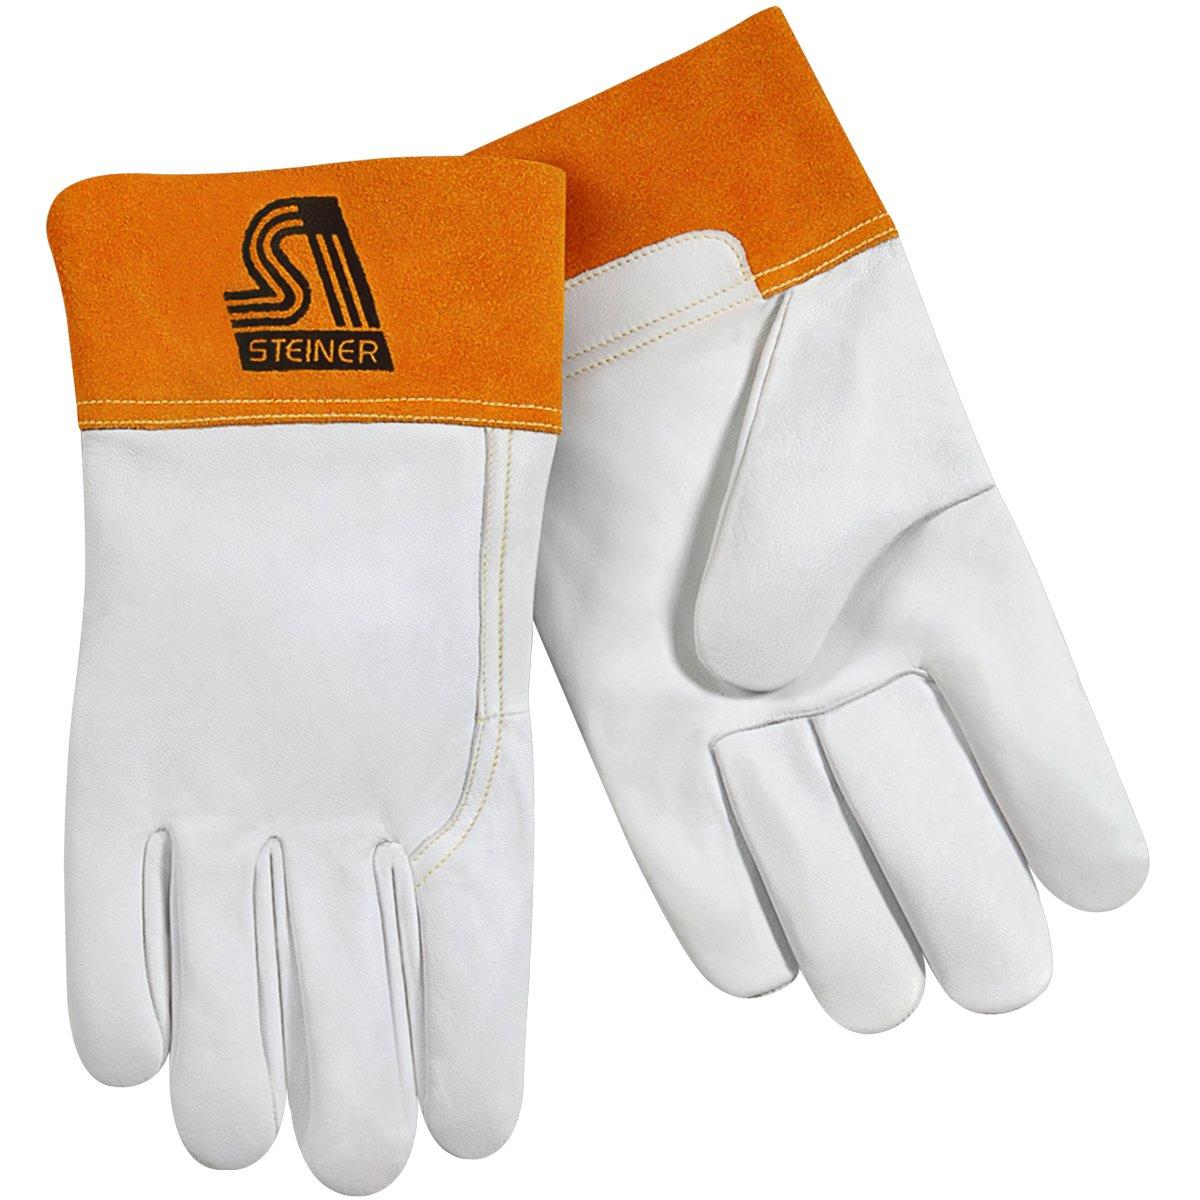 Steiner 0228-S TIG Gloves, Pearl Grain Goatskin Unlined 2-Inch Rust Cuff, Small